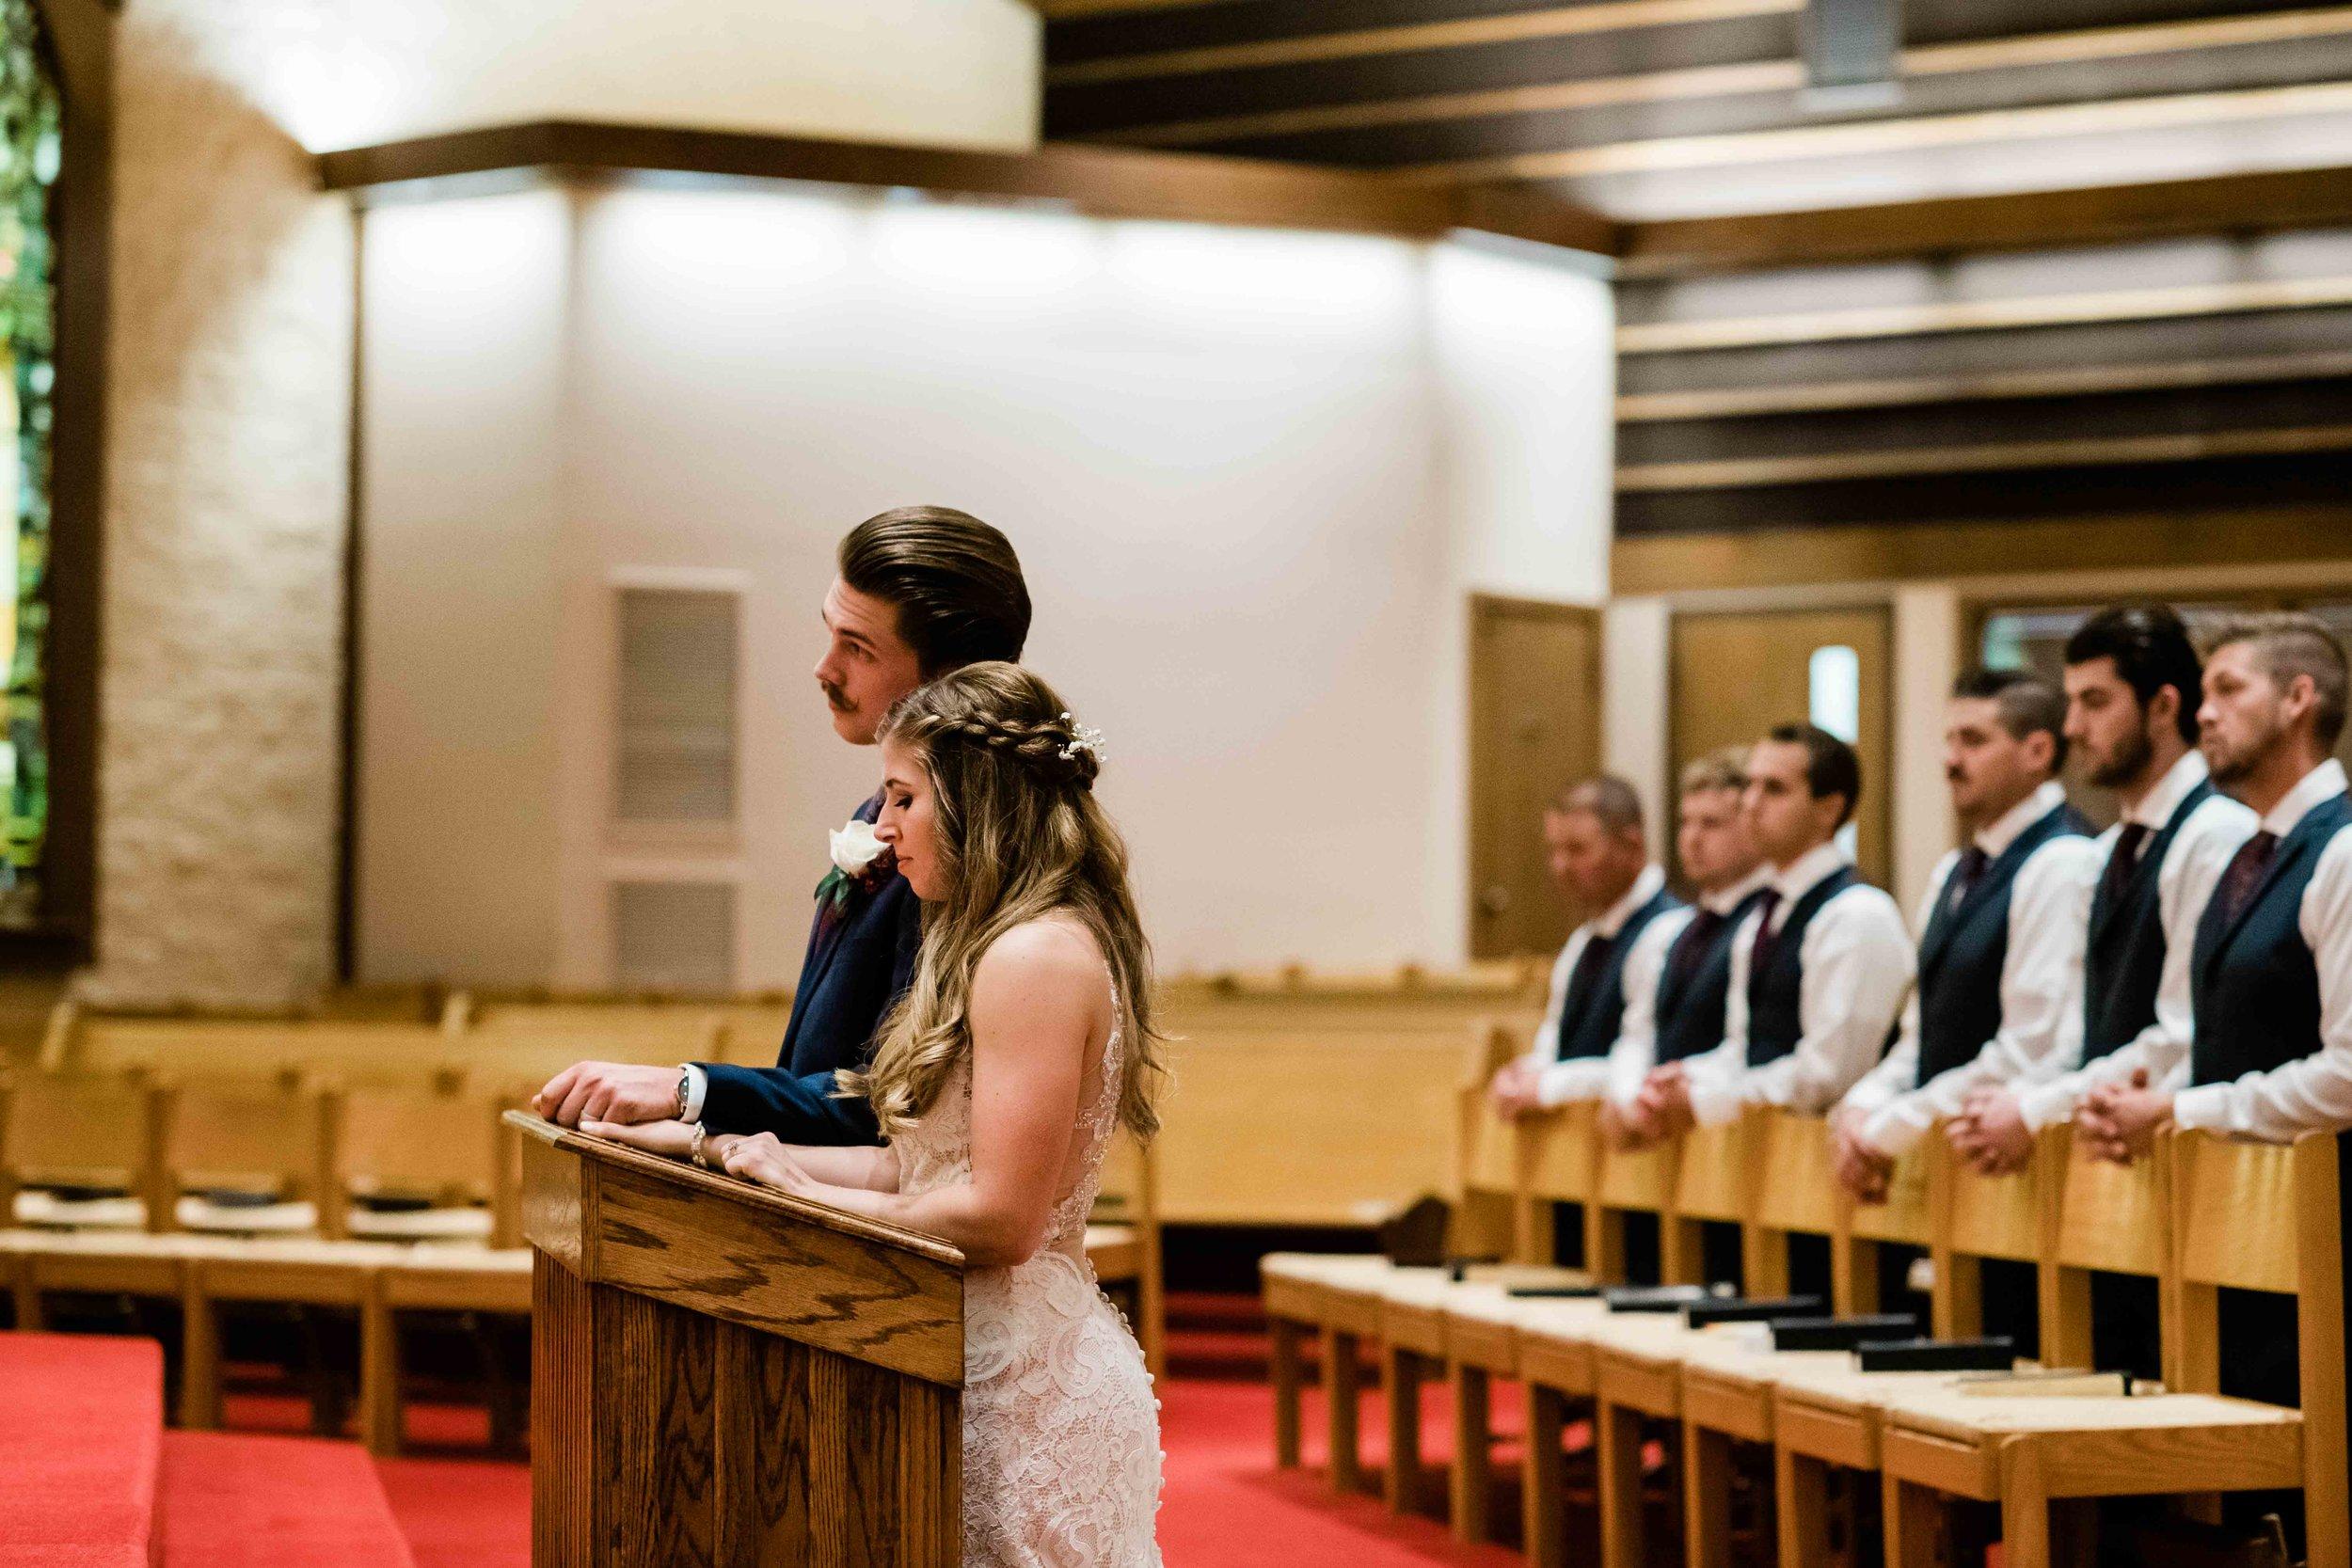 Bride and groom kneel during Catholic wedding ceremony